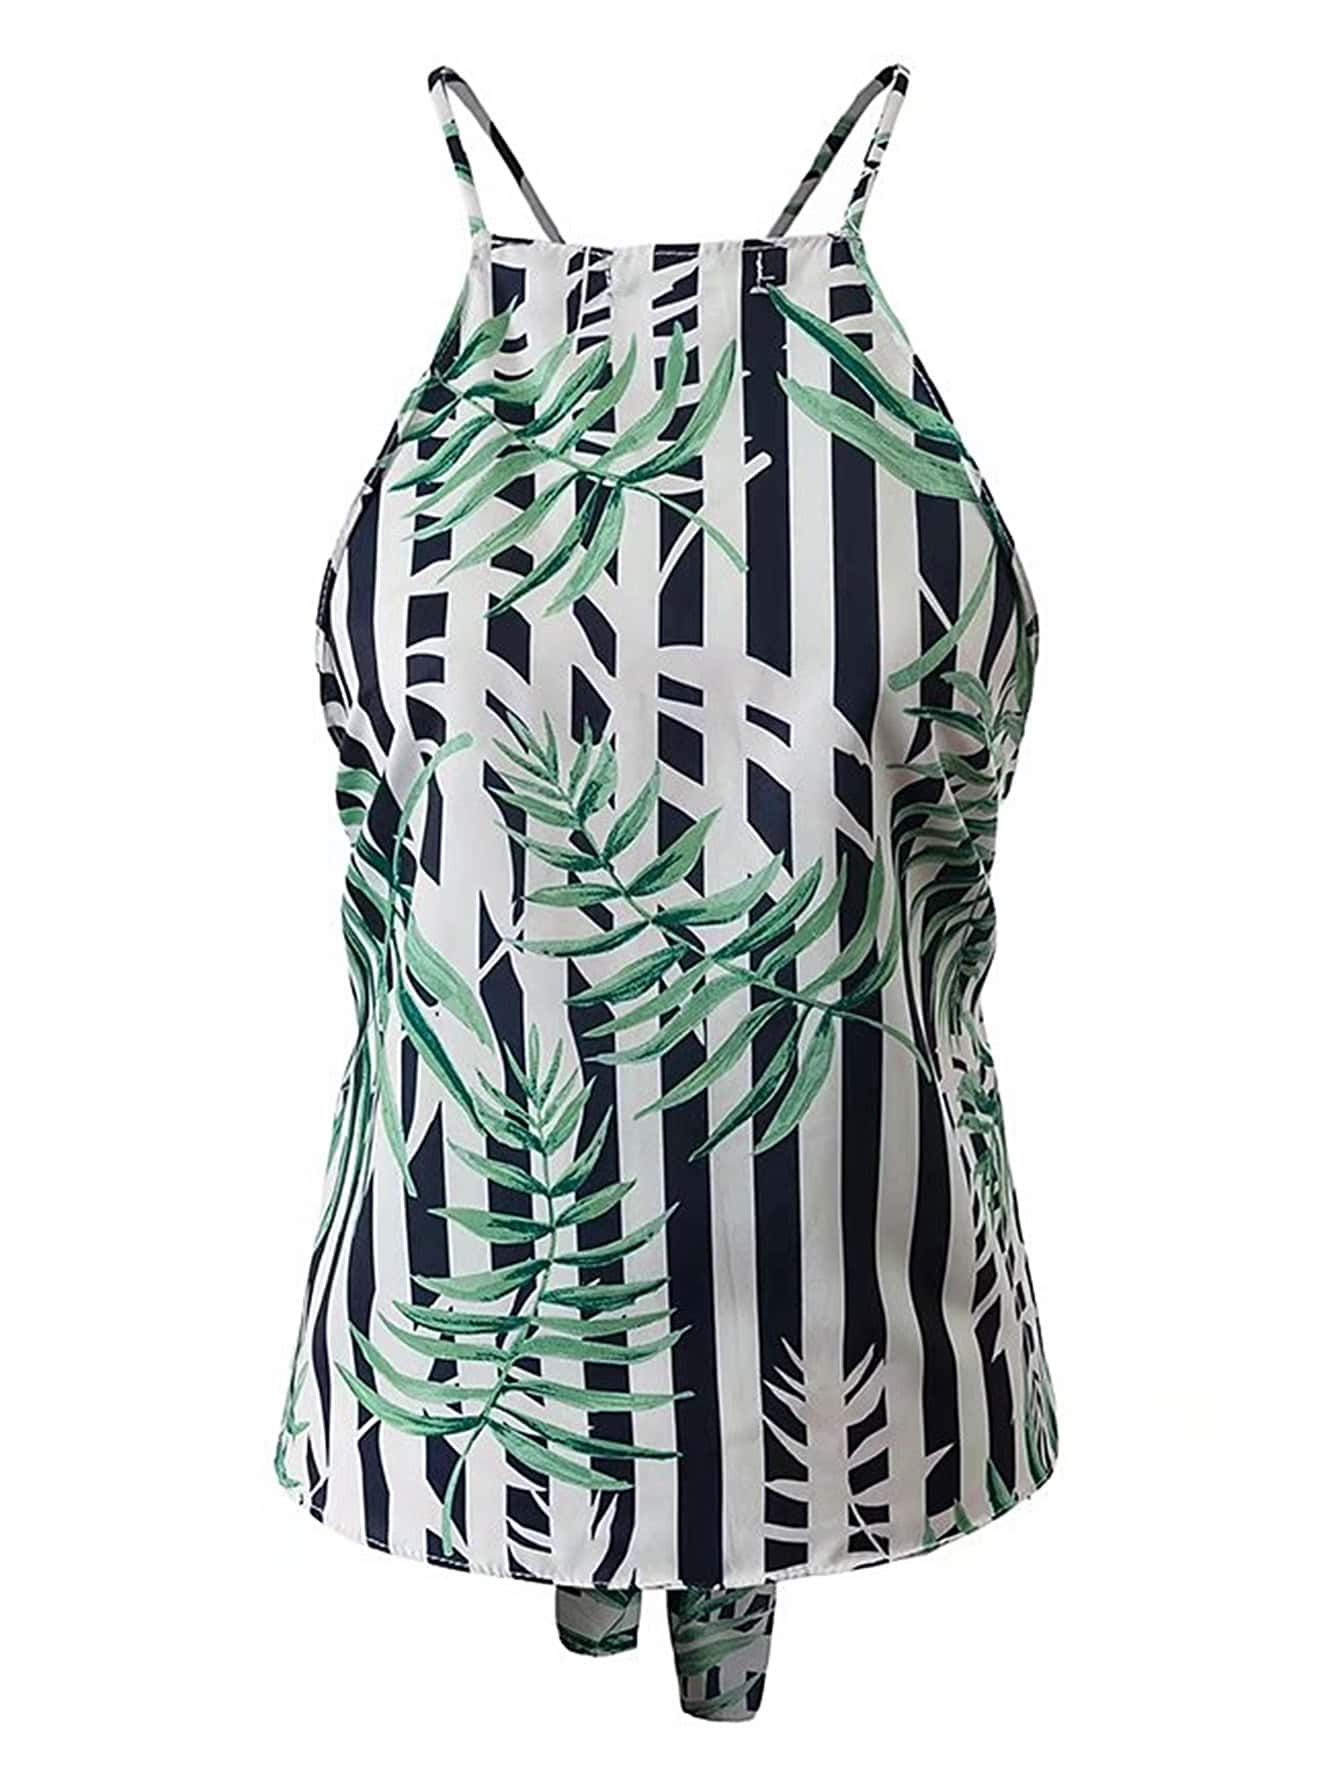 Vertical Striped Criss Cross Back Top vest170504201